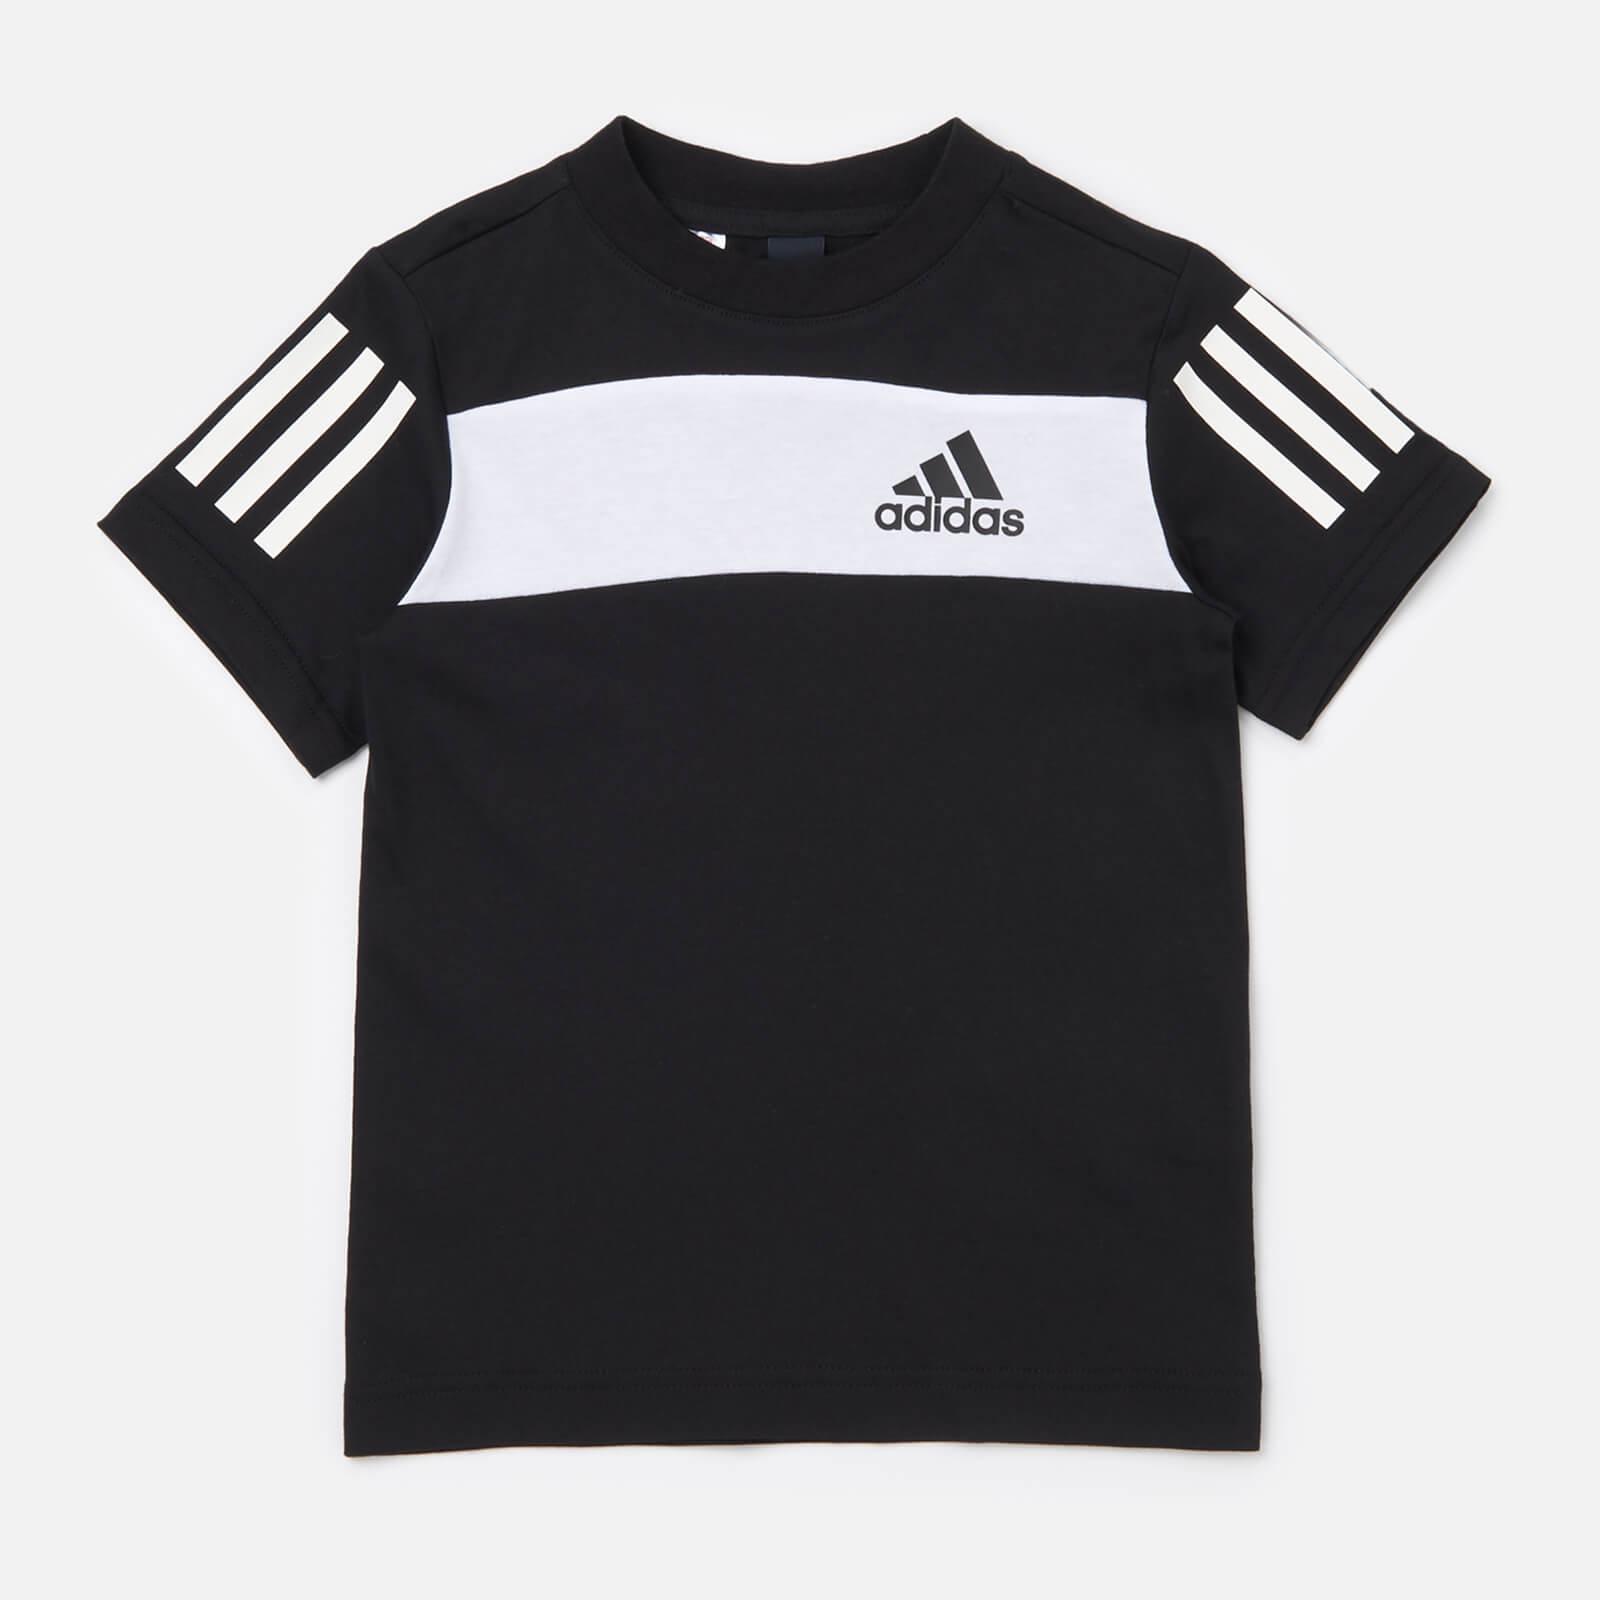 adidas Boys' Young Boys Sid T-Shirt - Black - 5-6 Years